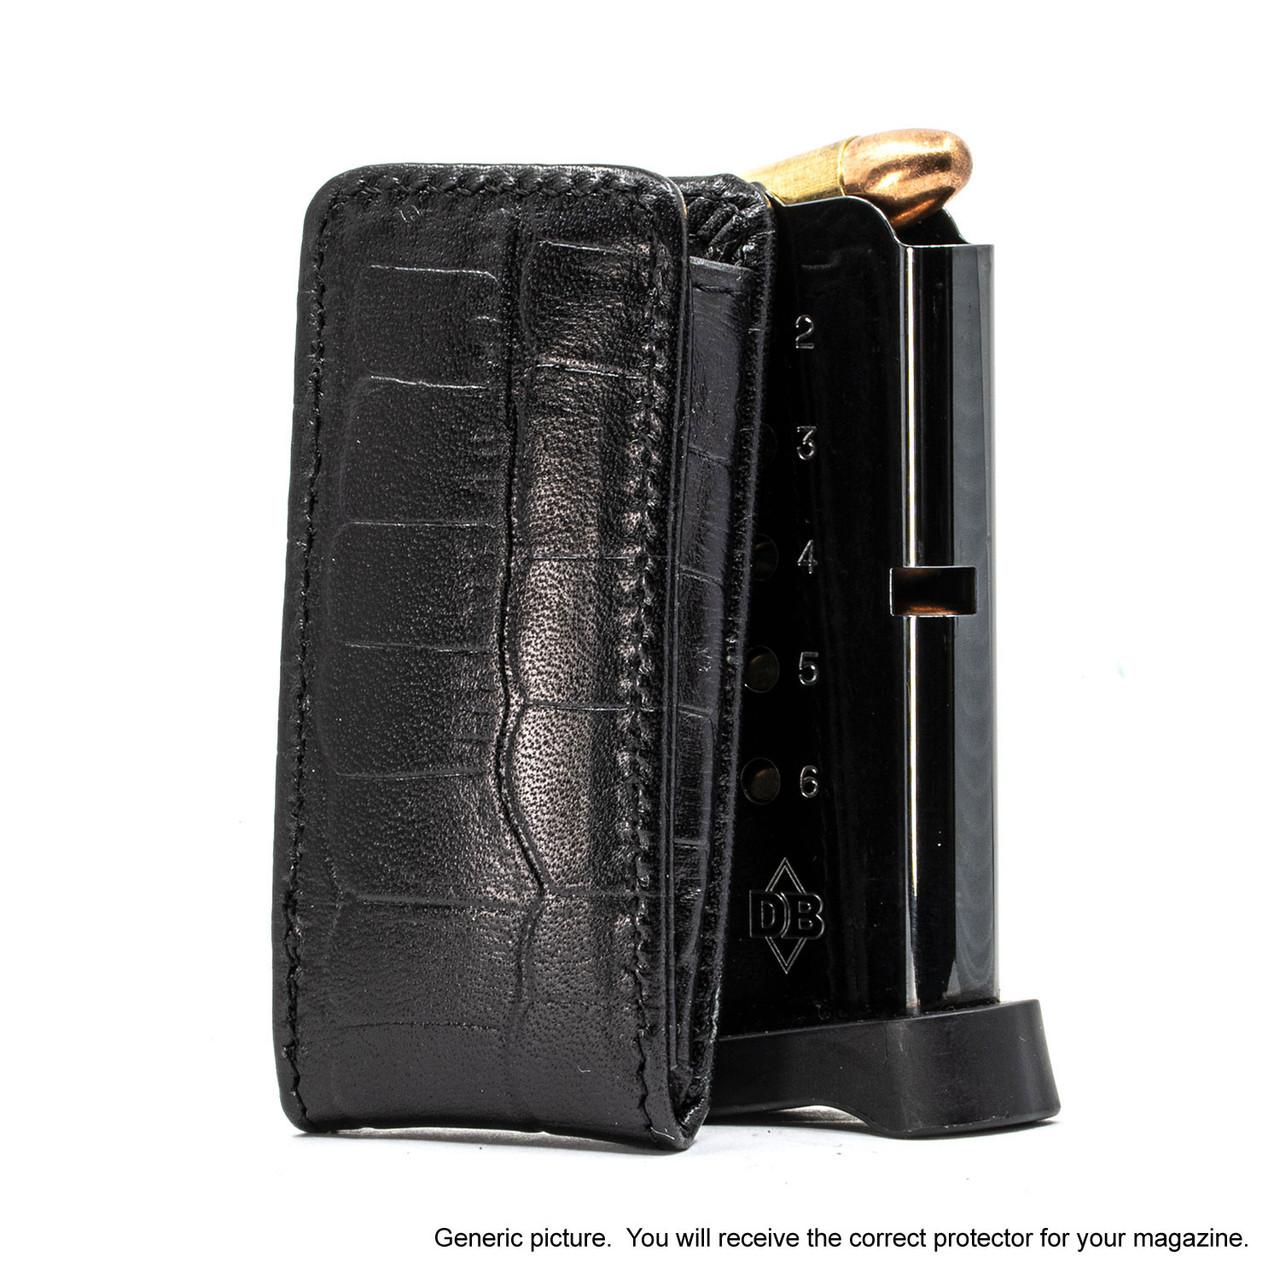 Taurus G2S Black Alligator Magazine Pocket Protector